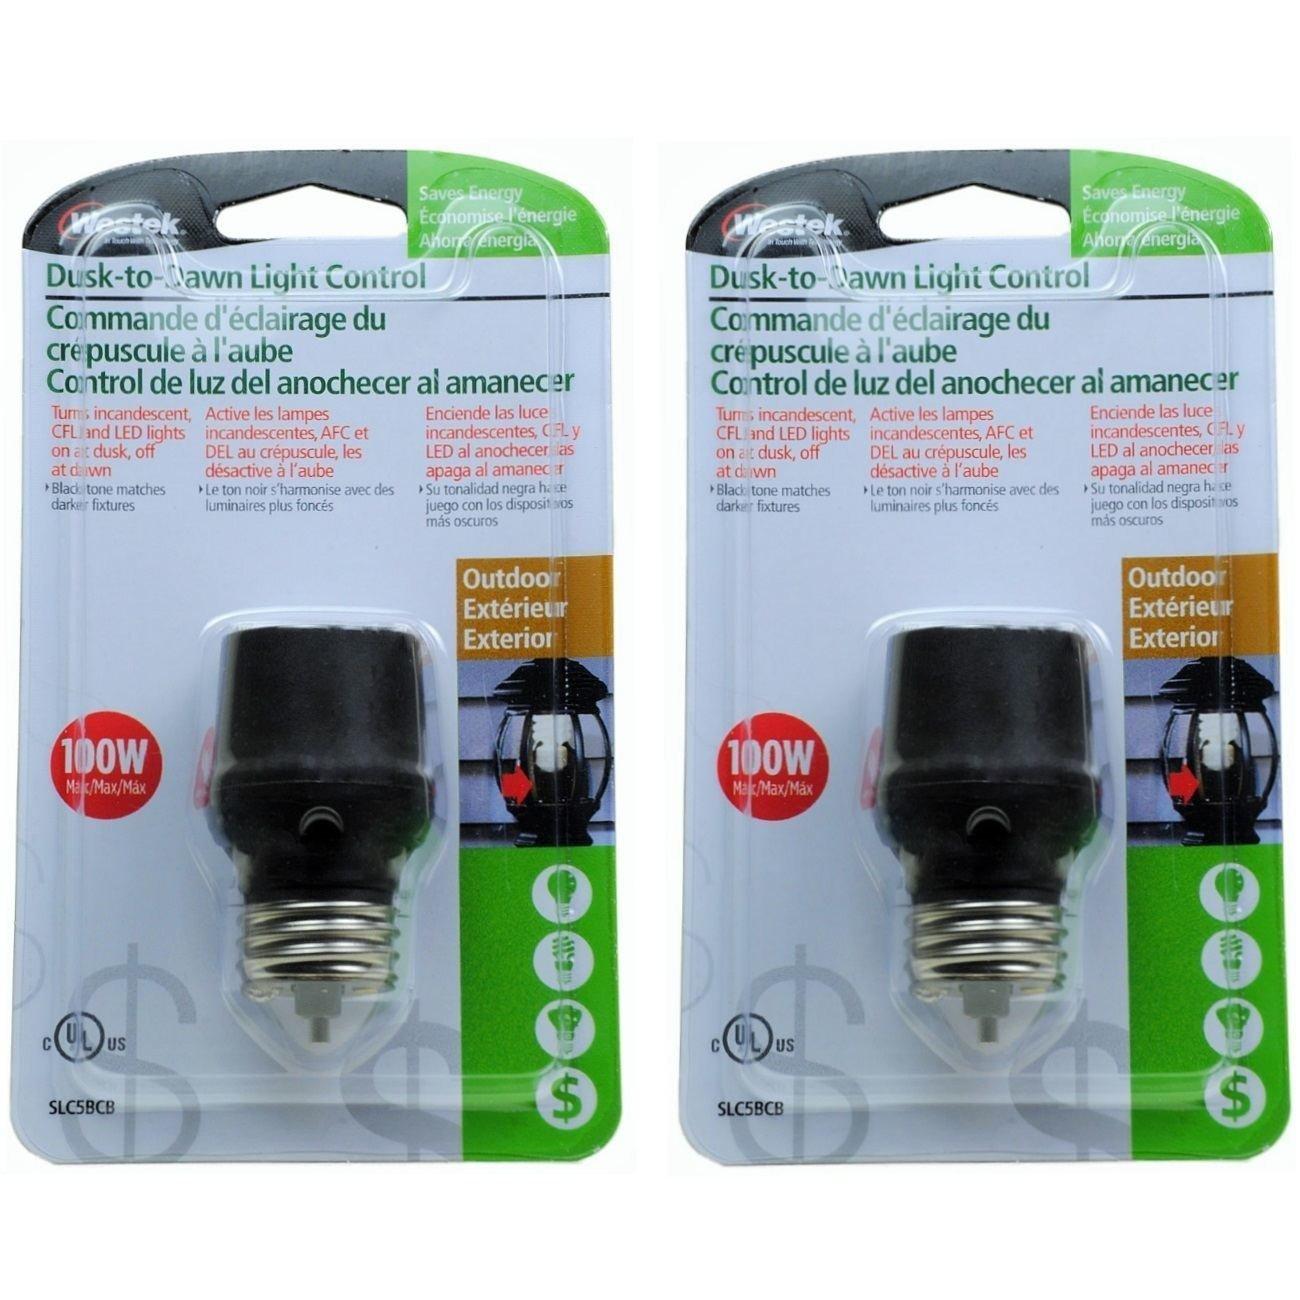 Automatic dusk to dawn light control - Westek Slc5bcb Outdoor Indoor Dusk To Dawn Light Control For Cfl Led Bulbs Light Sockets Amazon Com